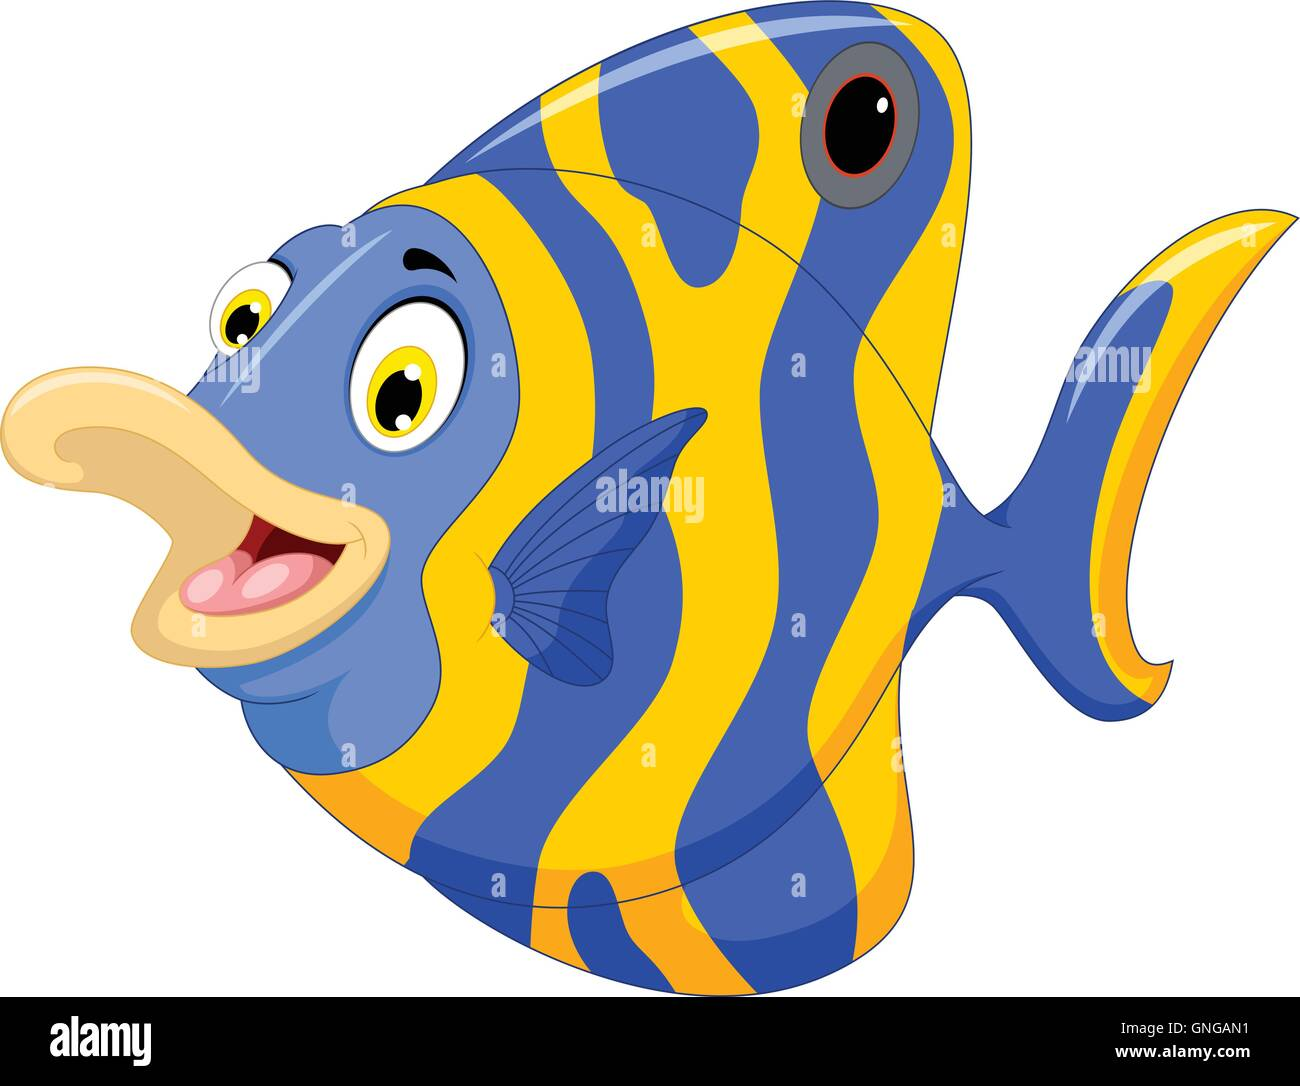 Uncategorized Cartoon Angel Fish funny angel fish cartoon stock vector art illustration cartoon